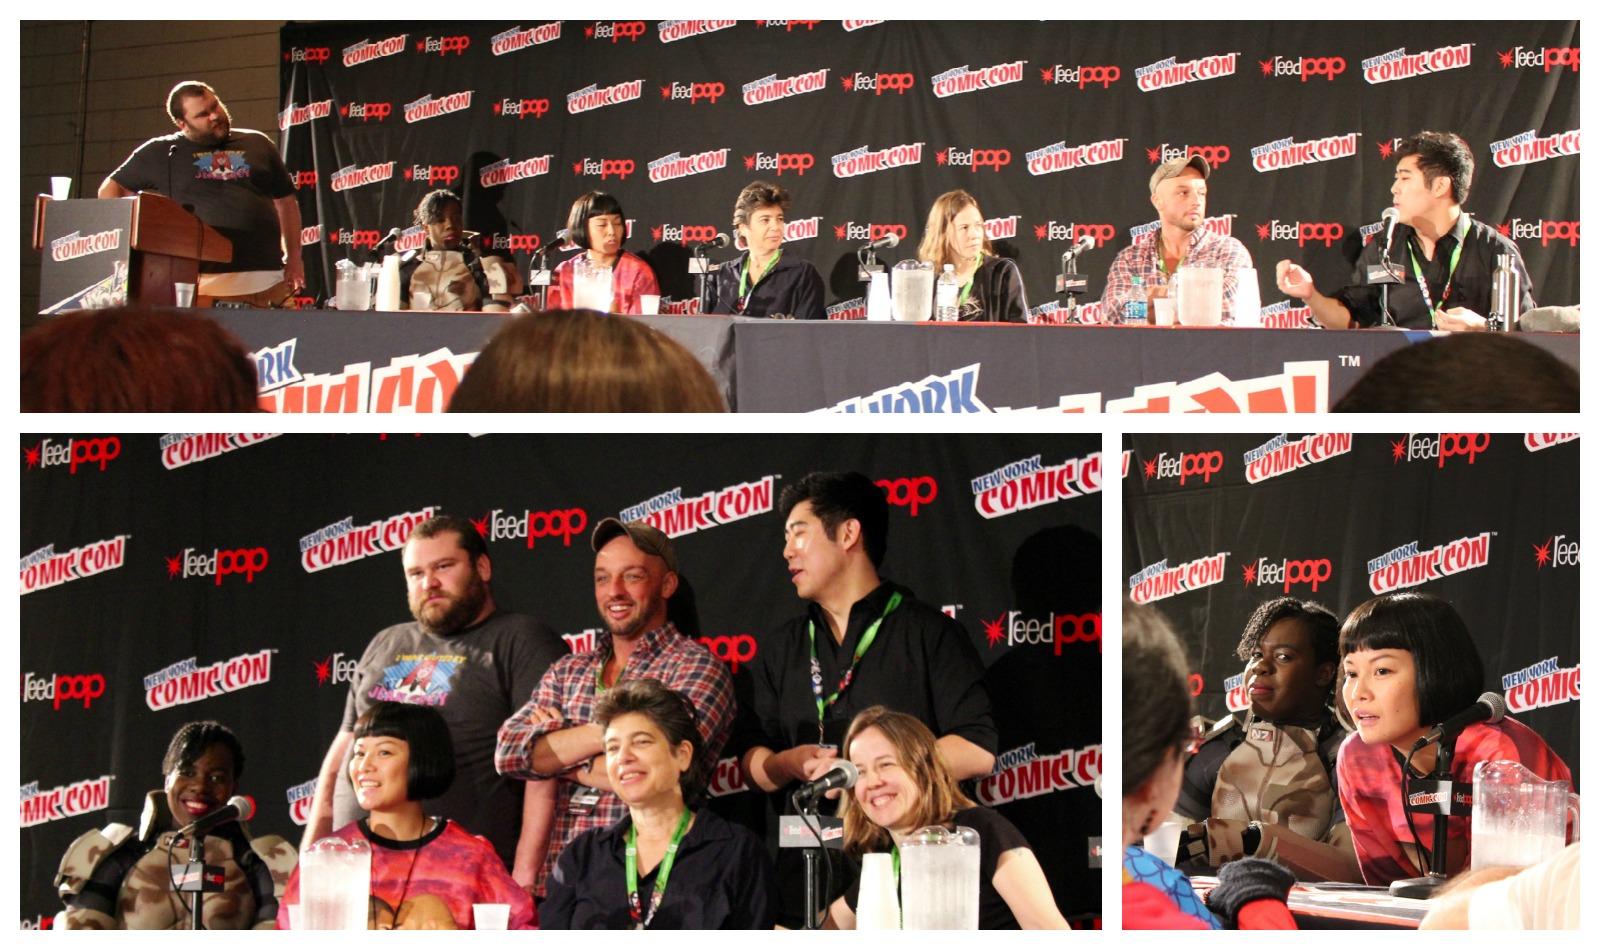 Culturally Queer: The Explosion of LGBTQ Representation in Mainstream Comics & Pop Culture. Moderator: Joey Stern. Panelists: Jay Justice, Annie Ishii, Jennifer Camper, Jennie Wood, Phil Jimenez, Daniel Ketchum.